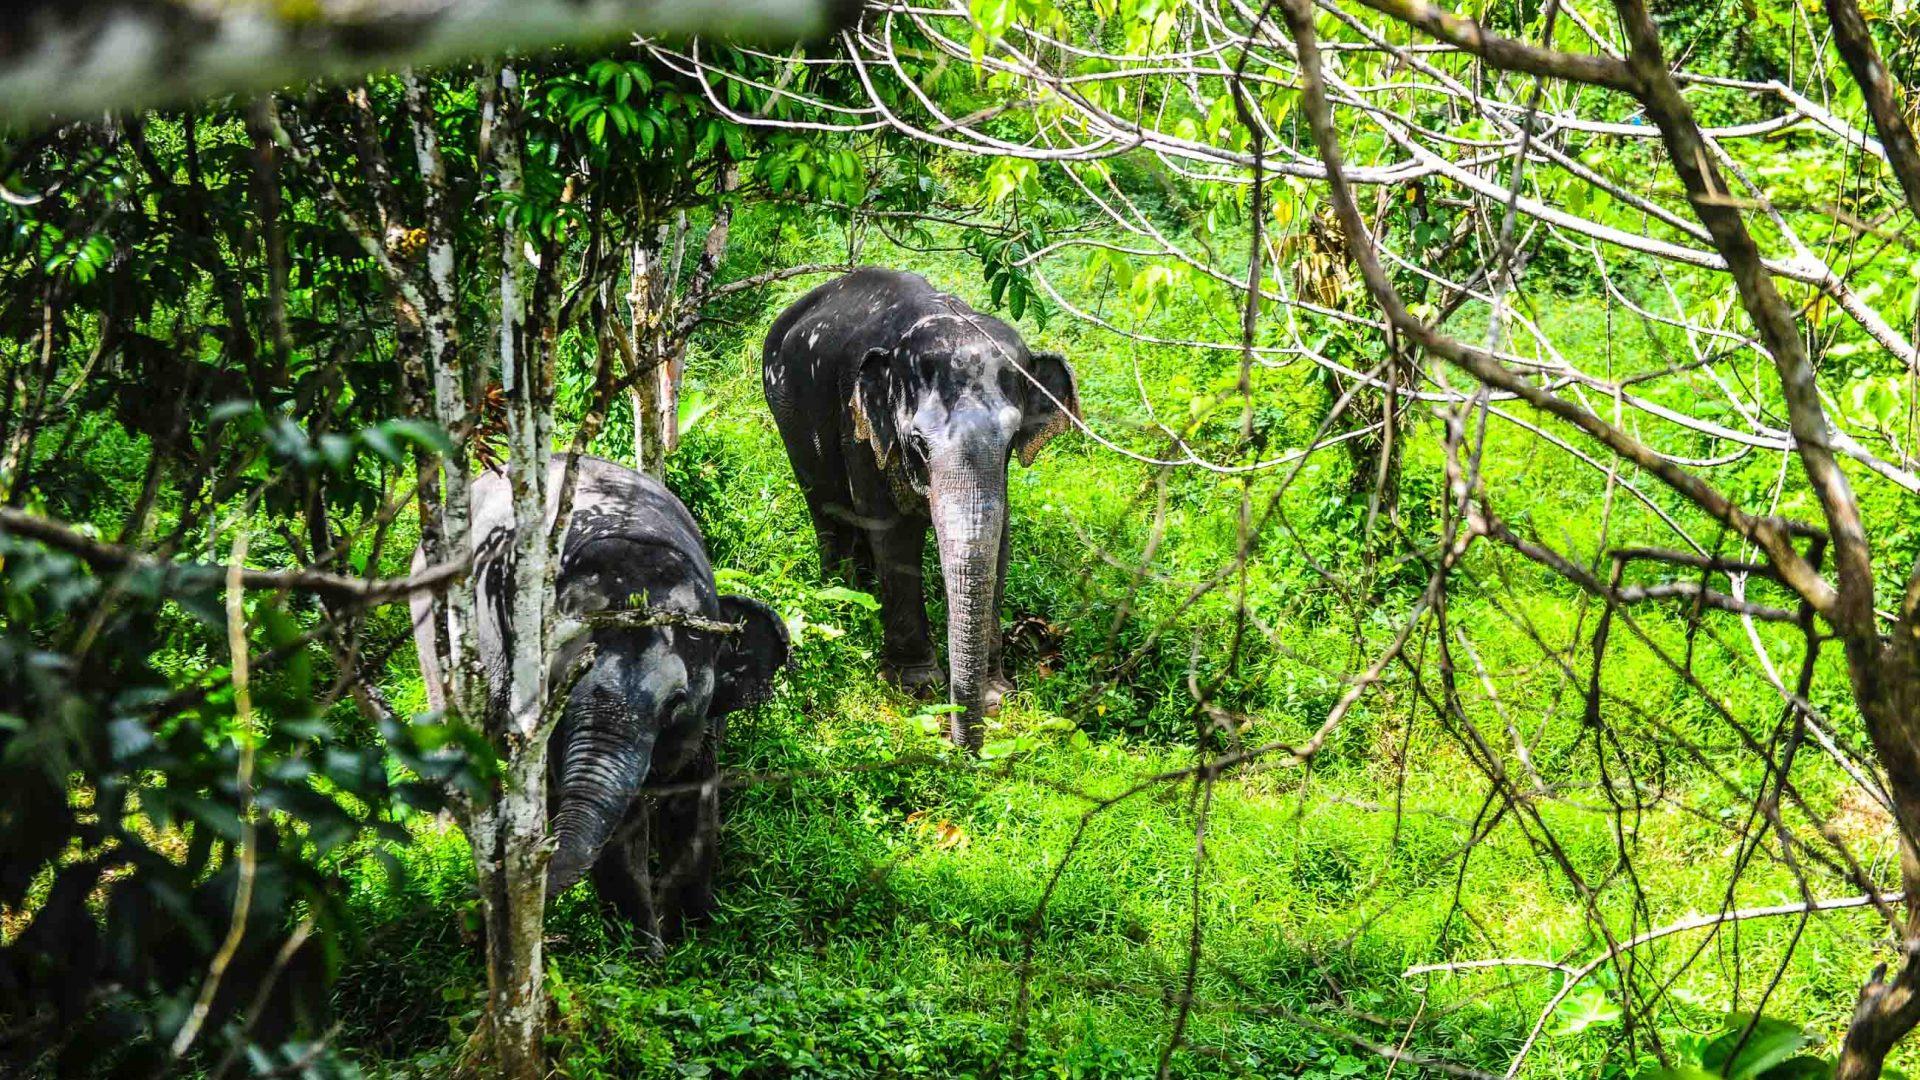 Elephants walking through the trees.